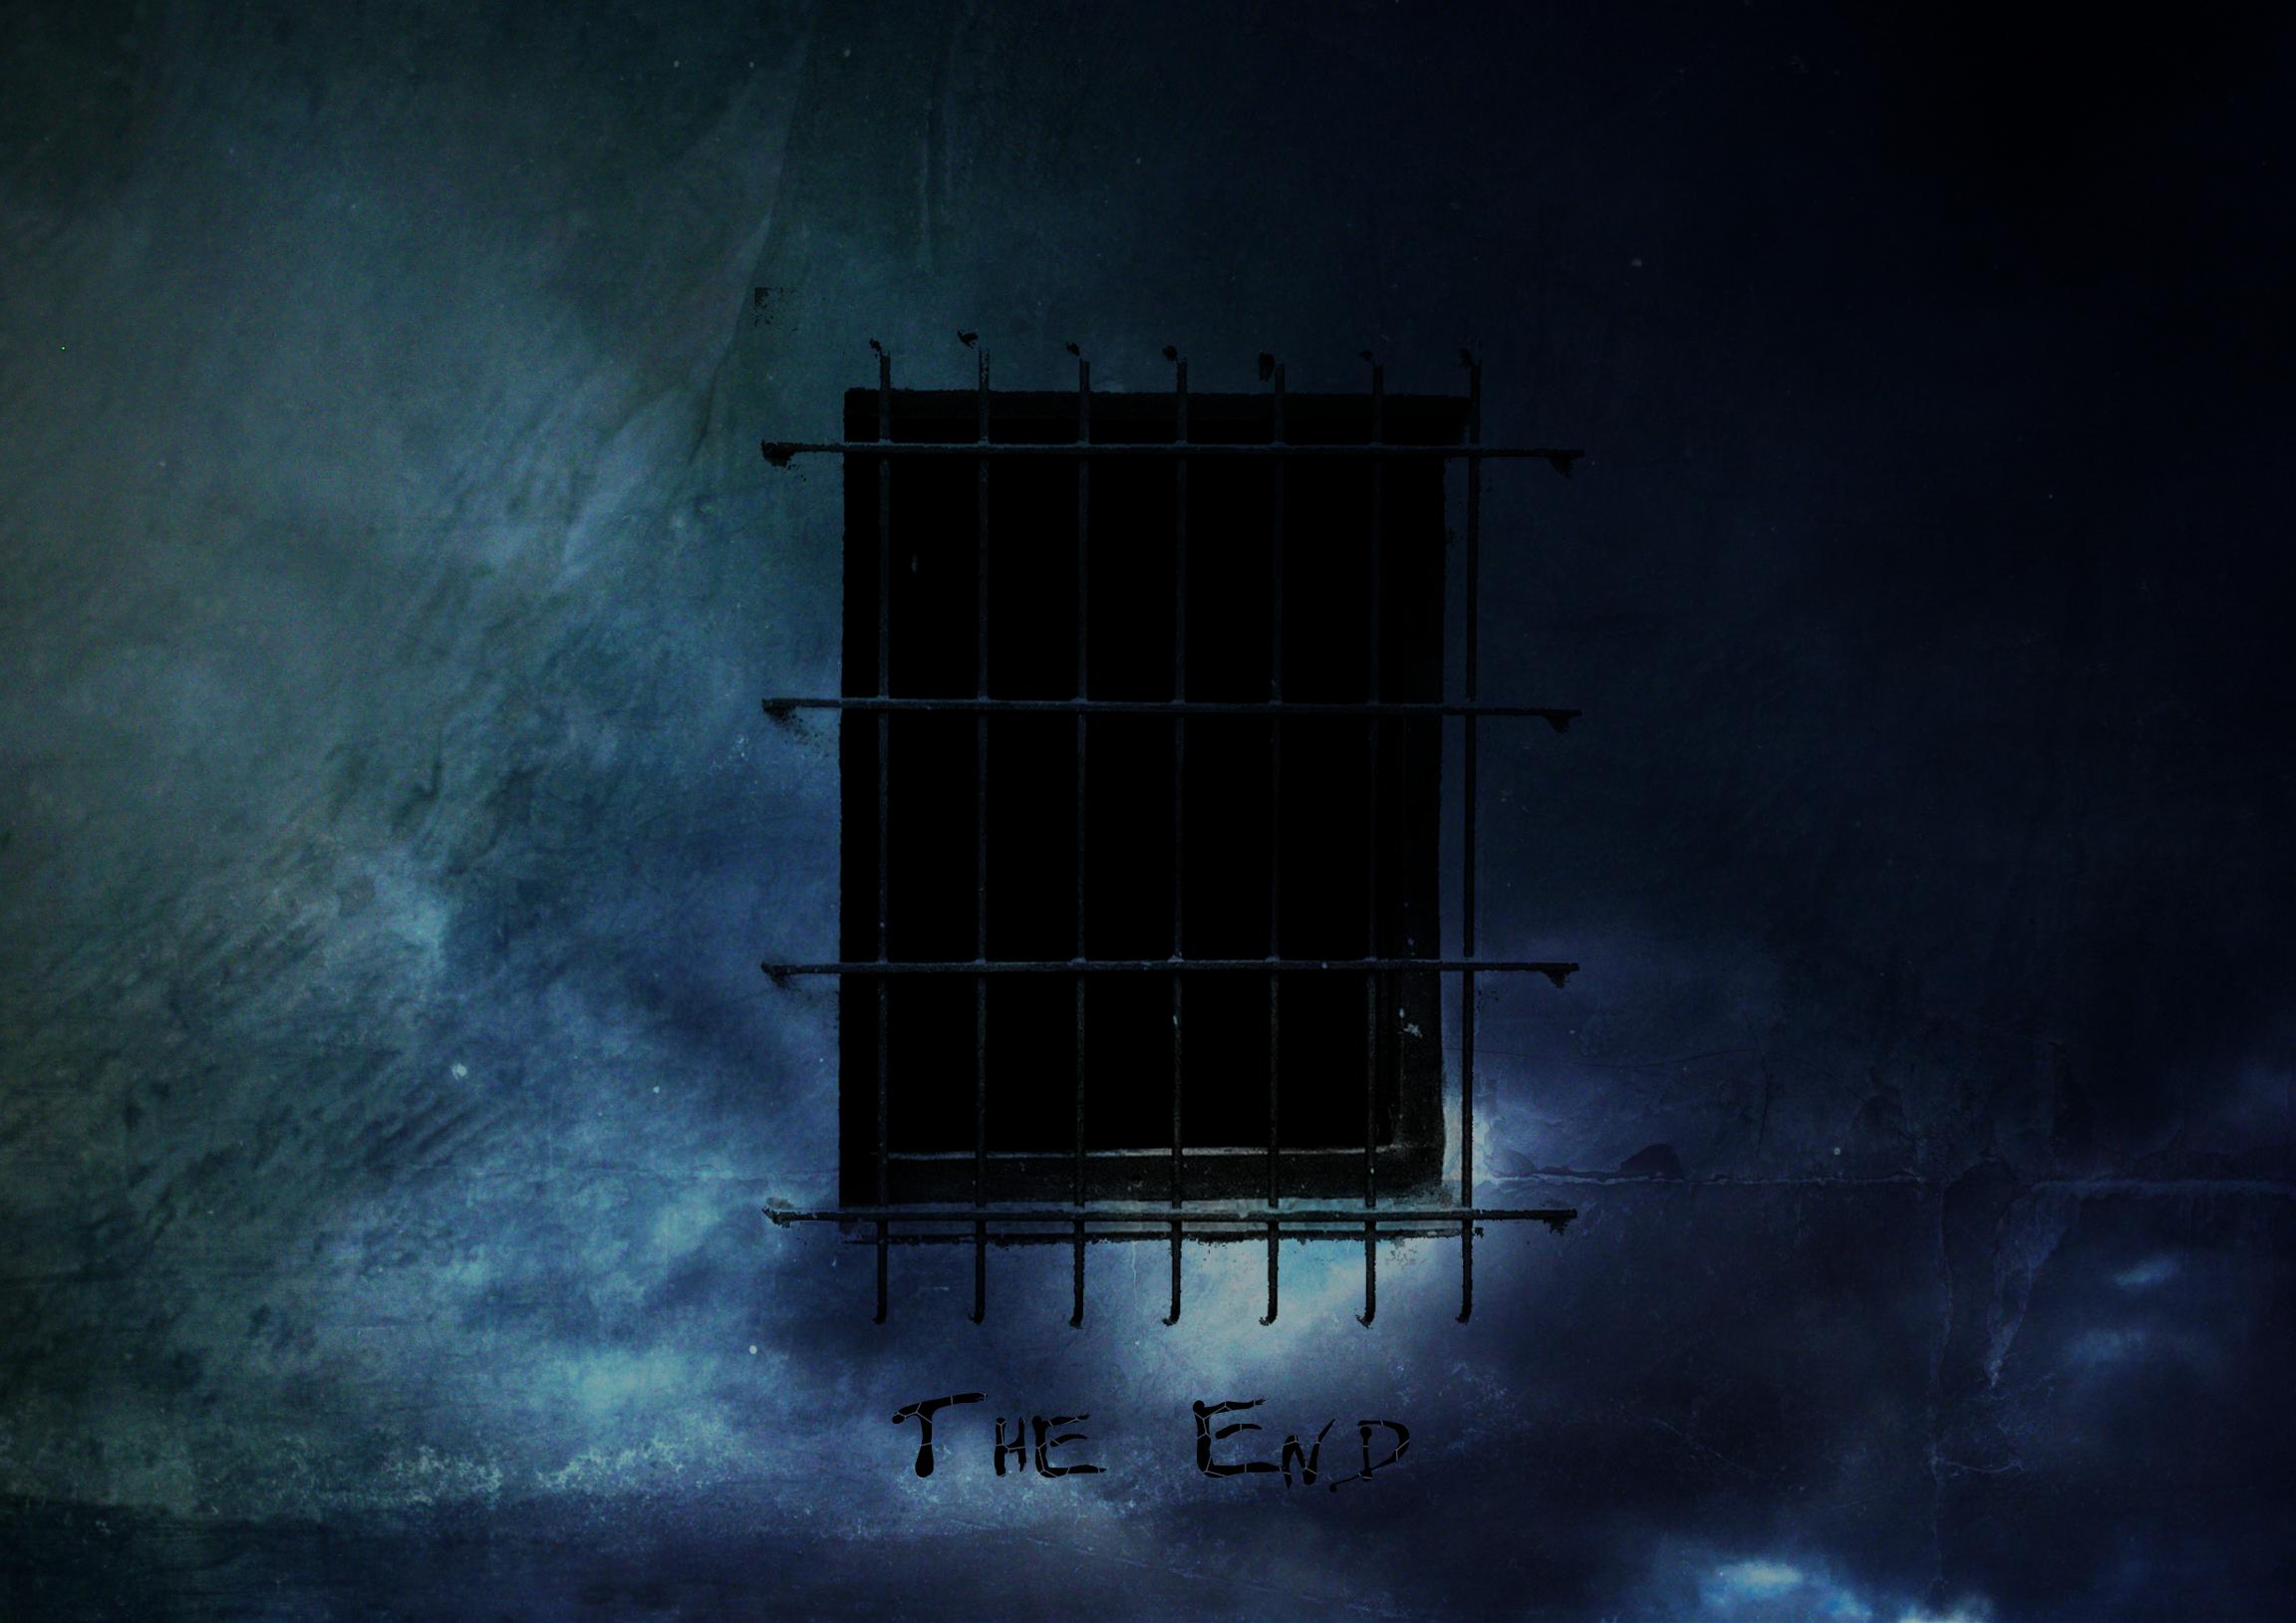 Movie Poster by cyborghyena